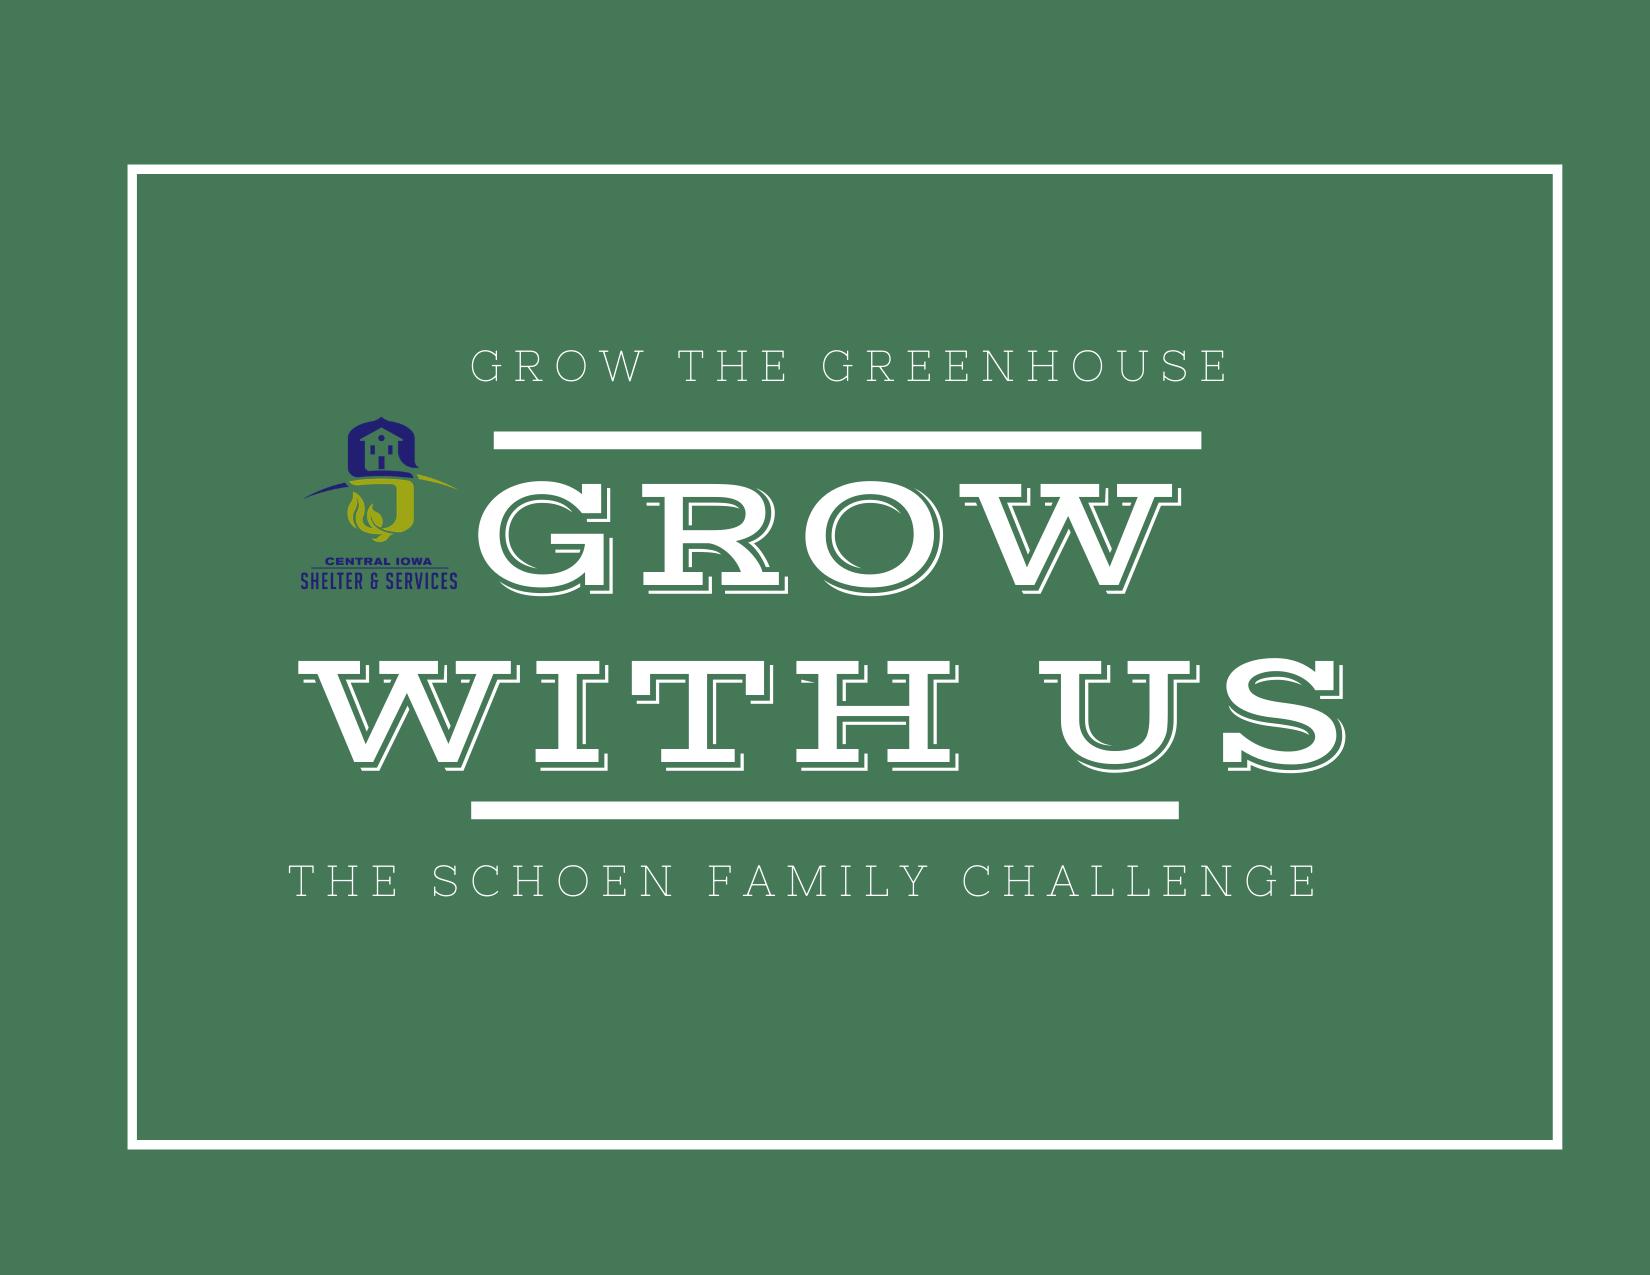 Grow The Greenhouse!